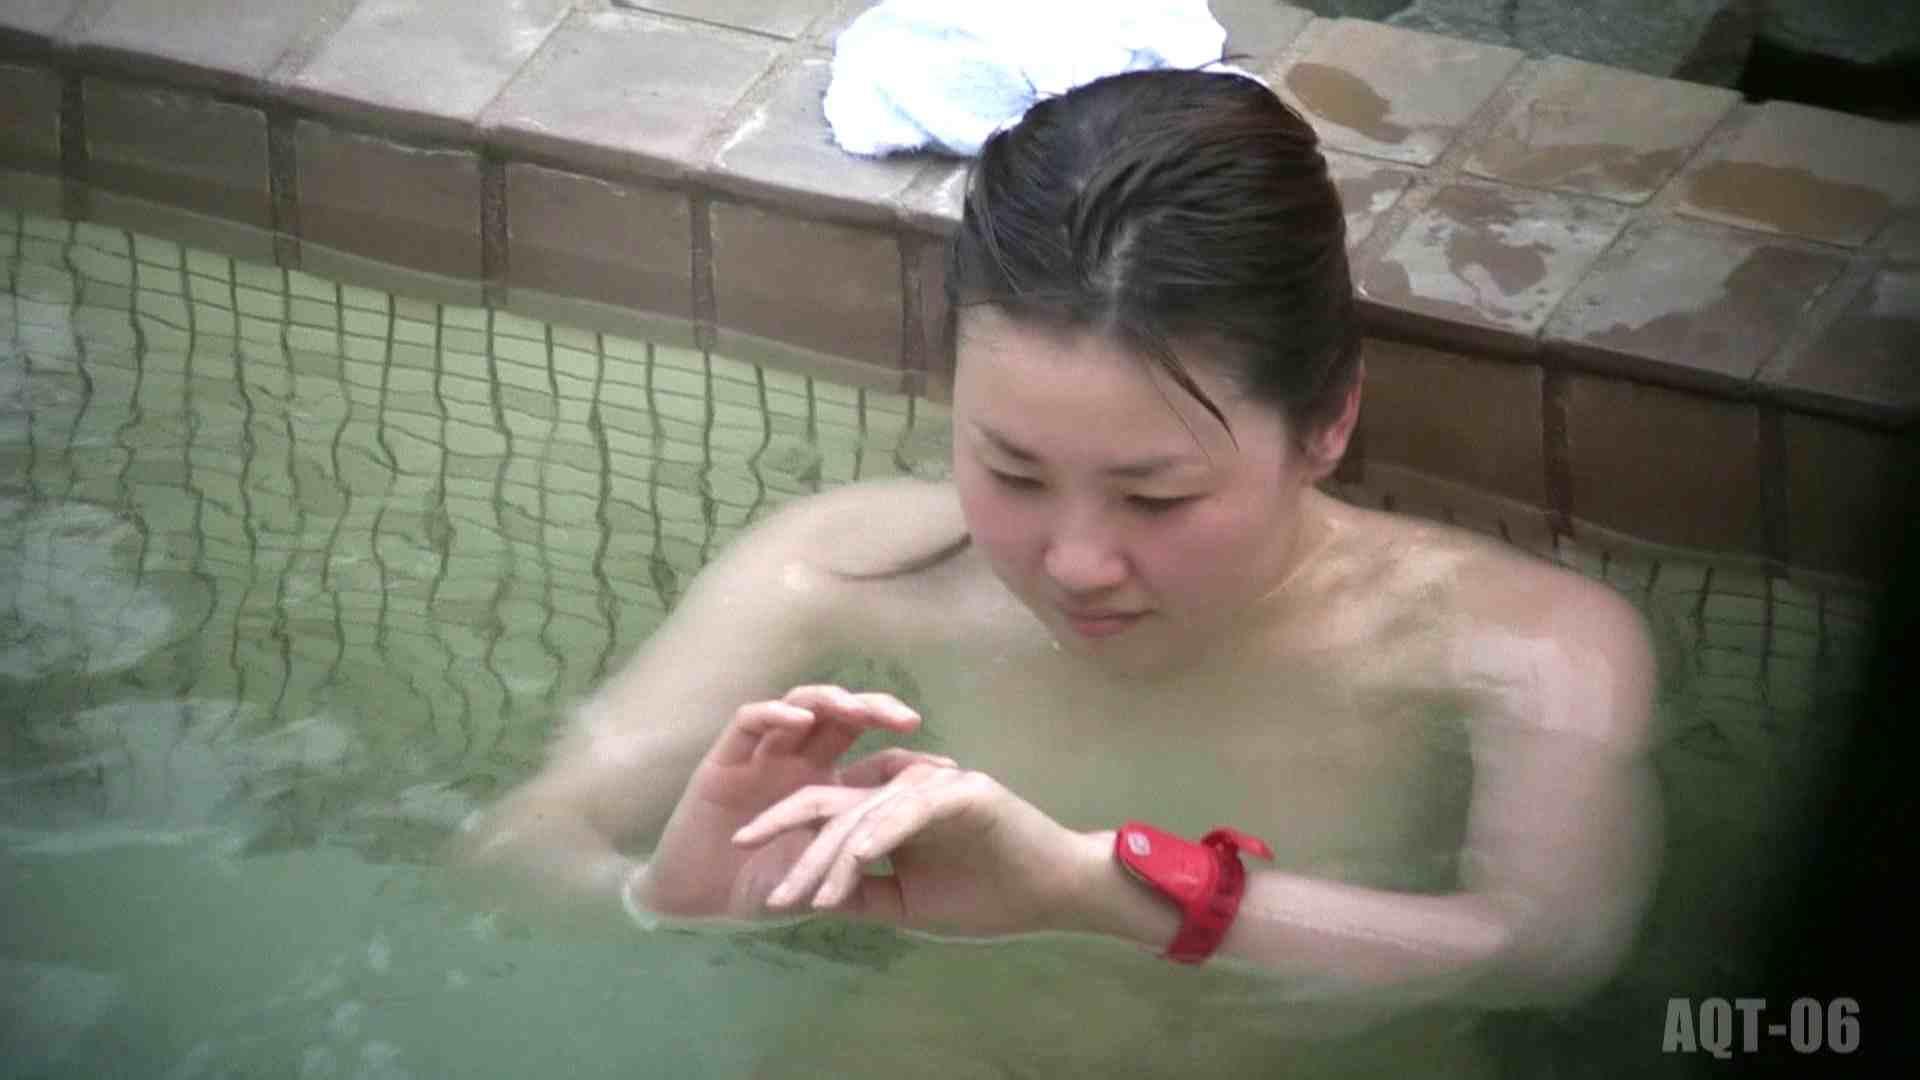 Aquaな露天風呂Vol.758 OL女体 すけべAV動画紹介 90連発 11